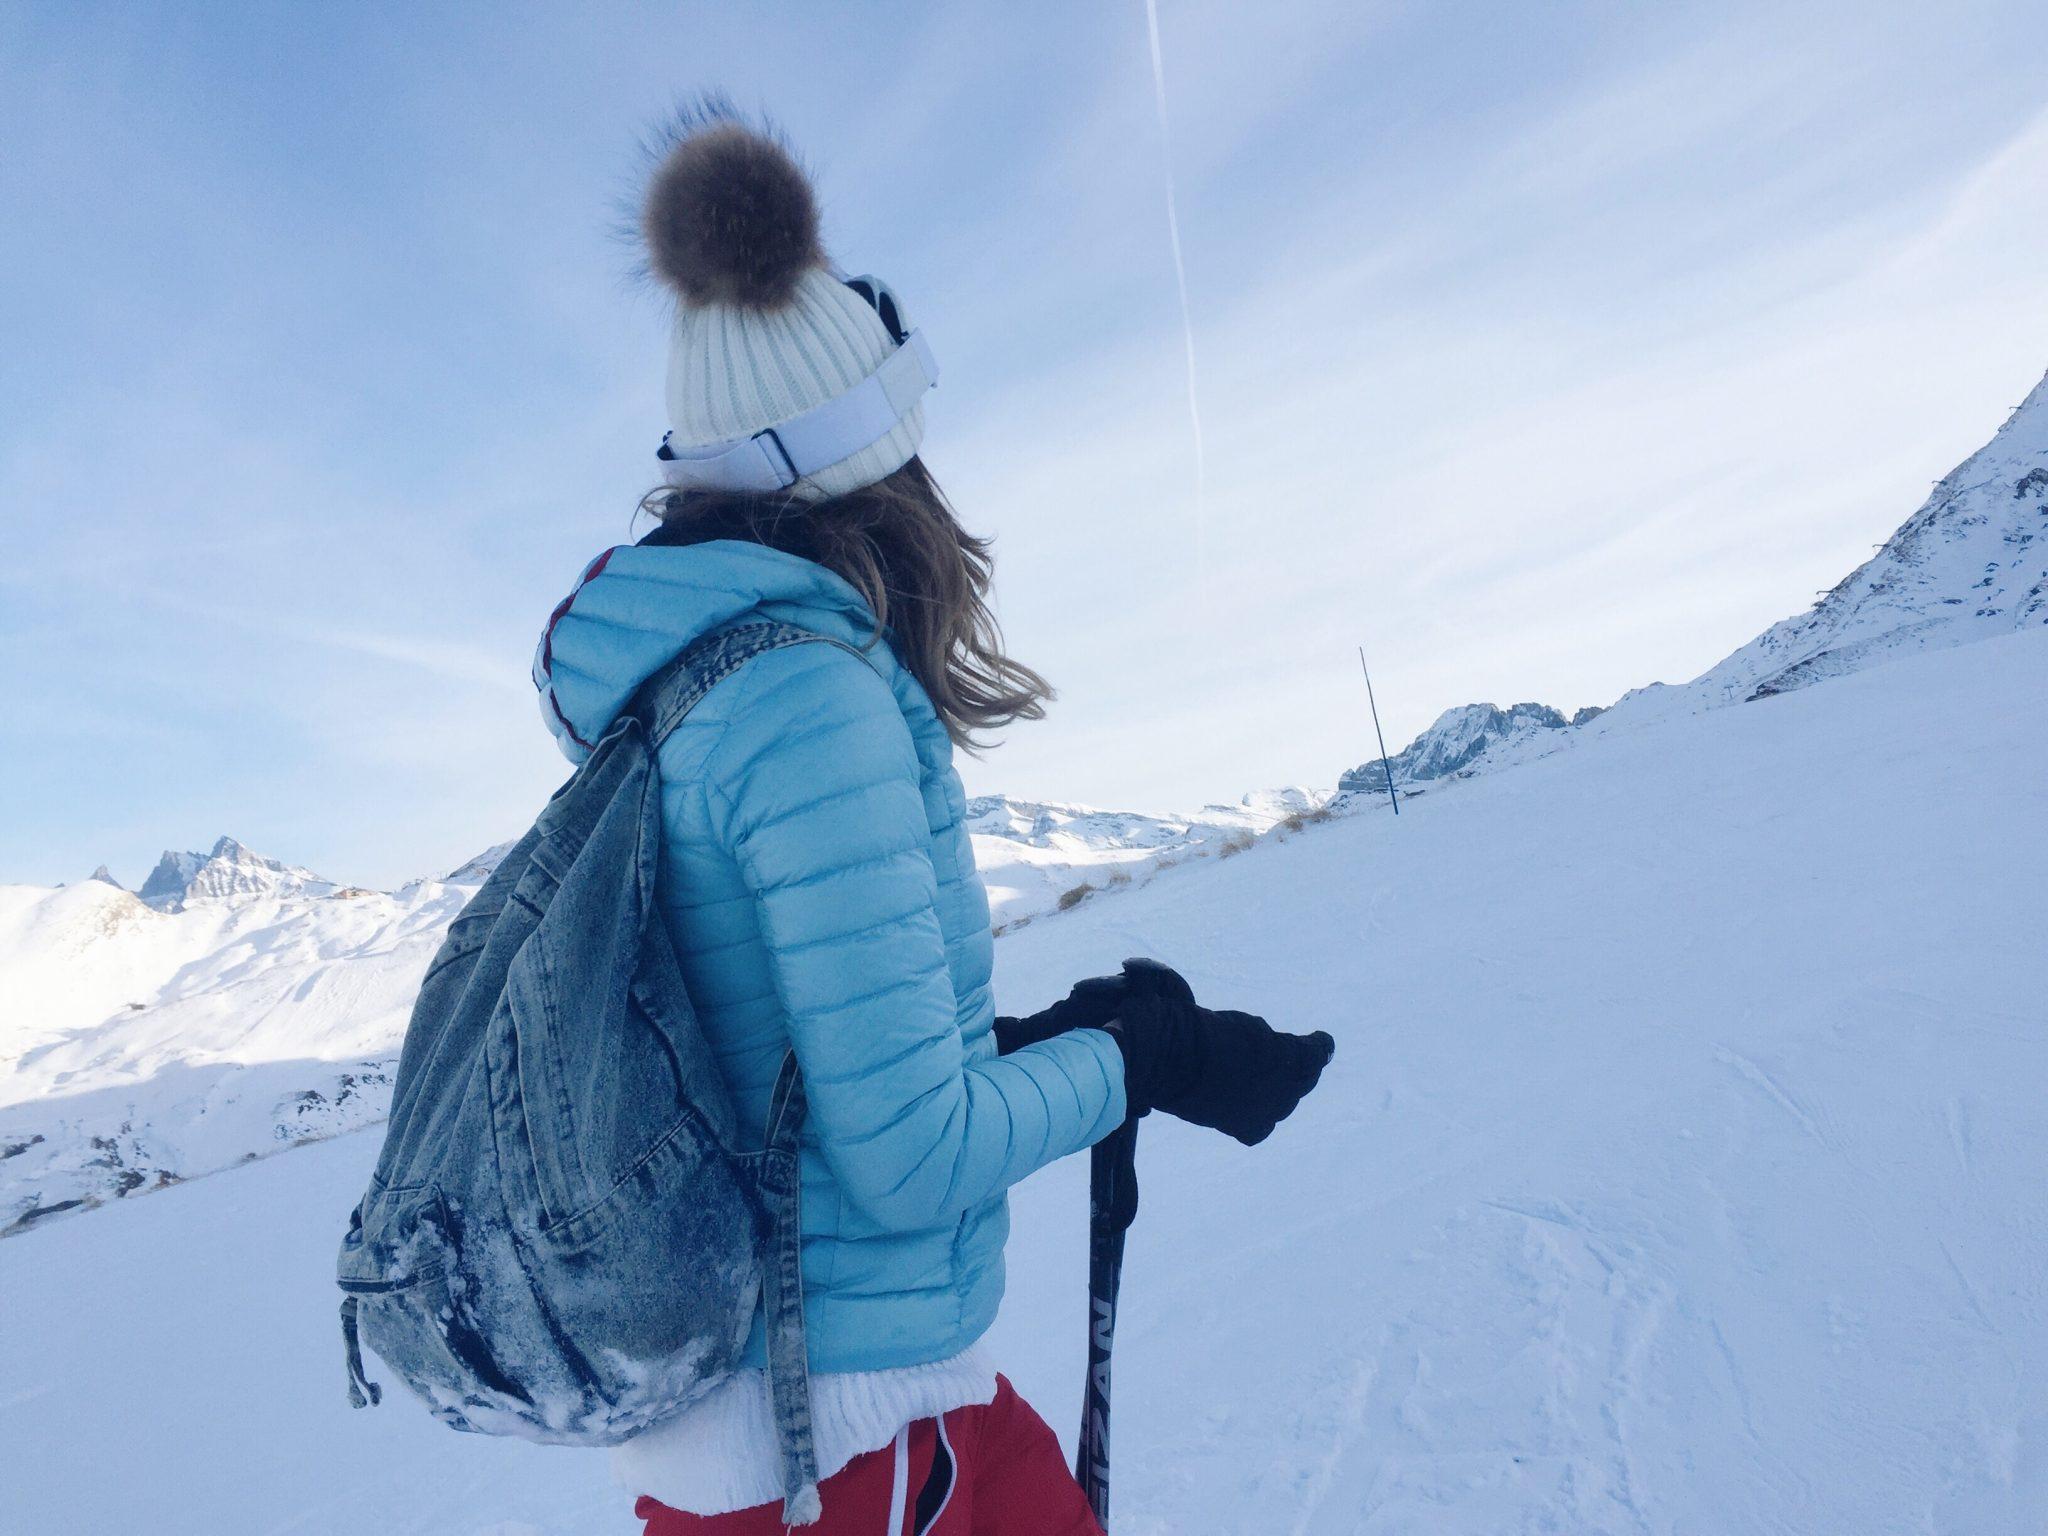 doudoune jott look ski blog mode – Ely Gypset